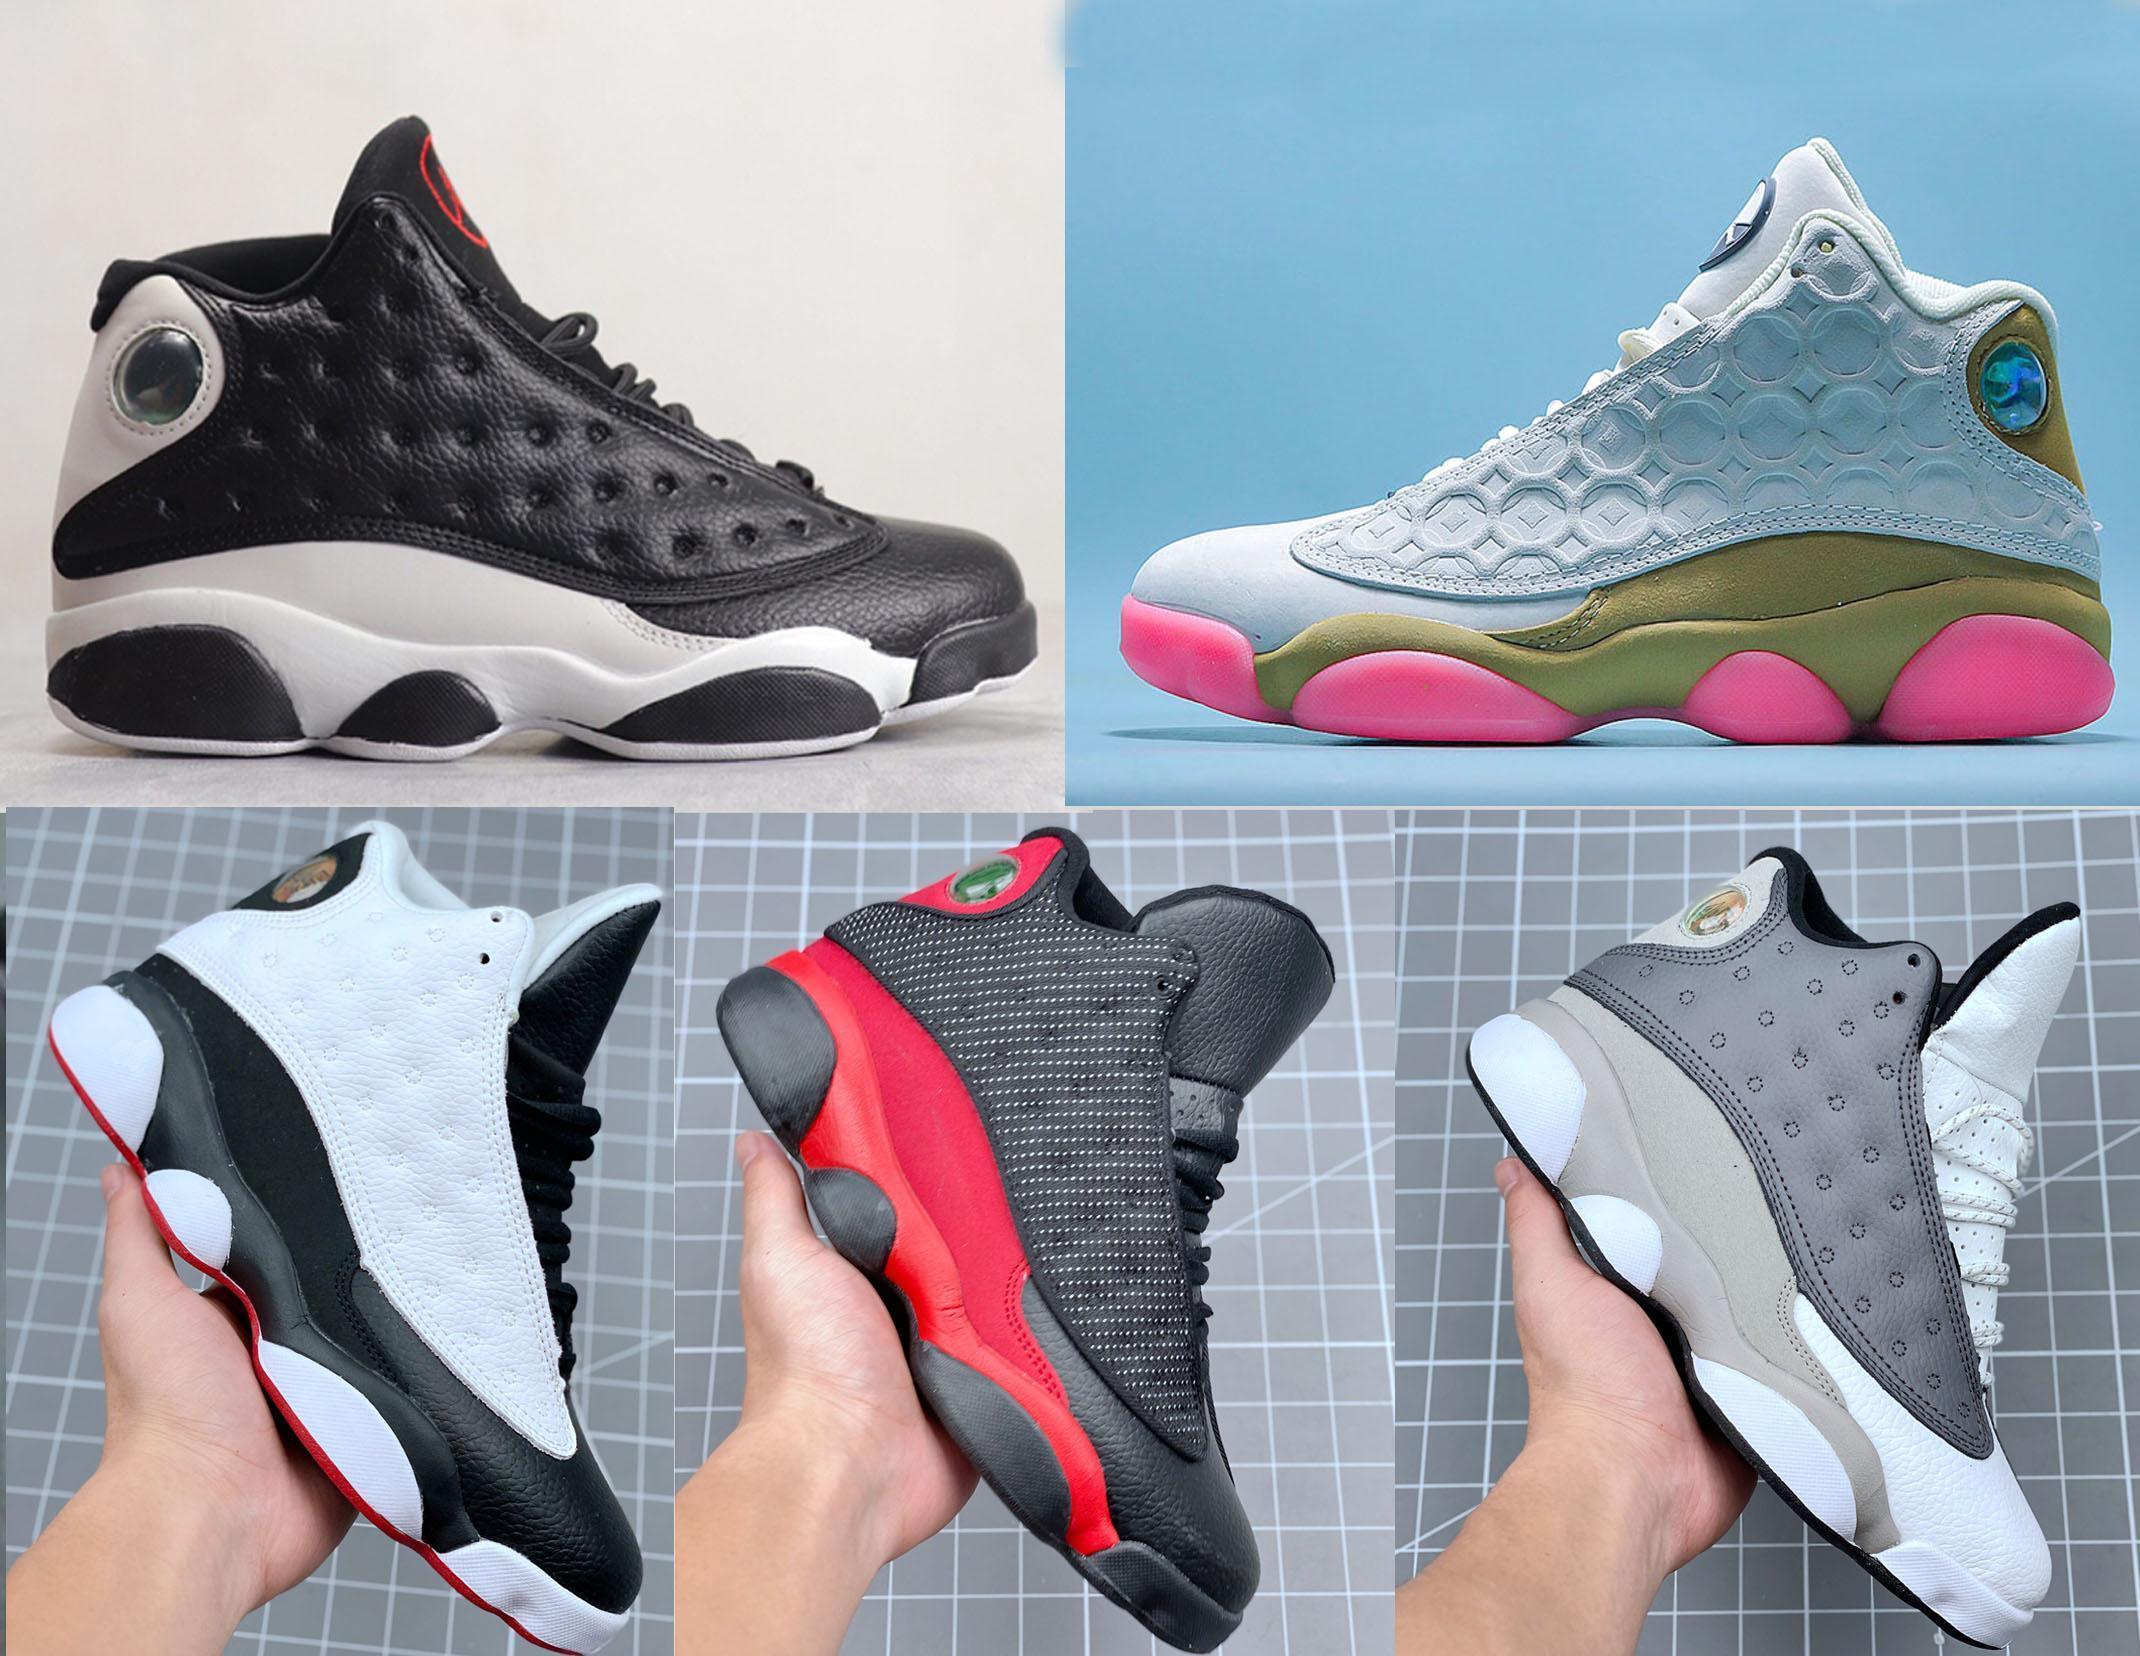 2020 Air мужской баскетбольной обуви 13s Он доигрались Concord 45 23 Ray PE 13 низкий Разводят мужчин Sports Snead joo8272